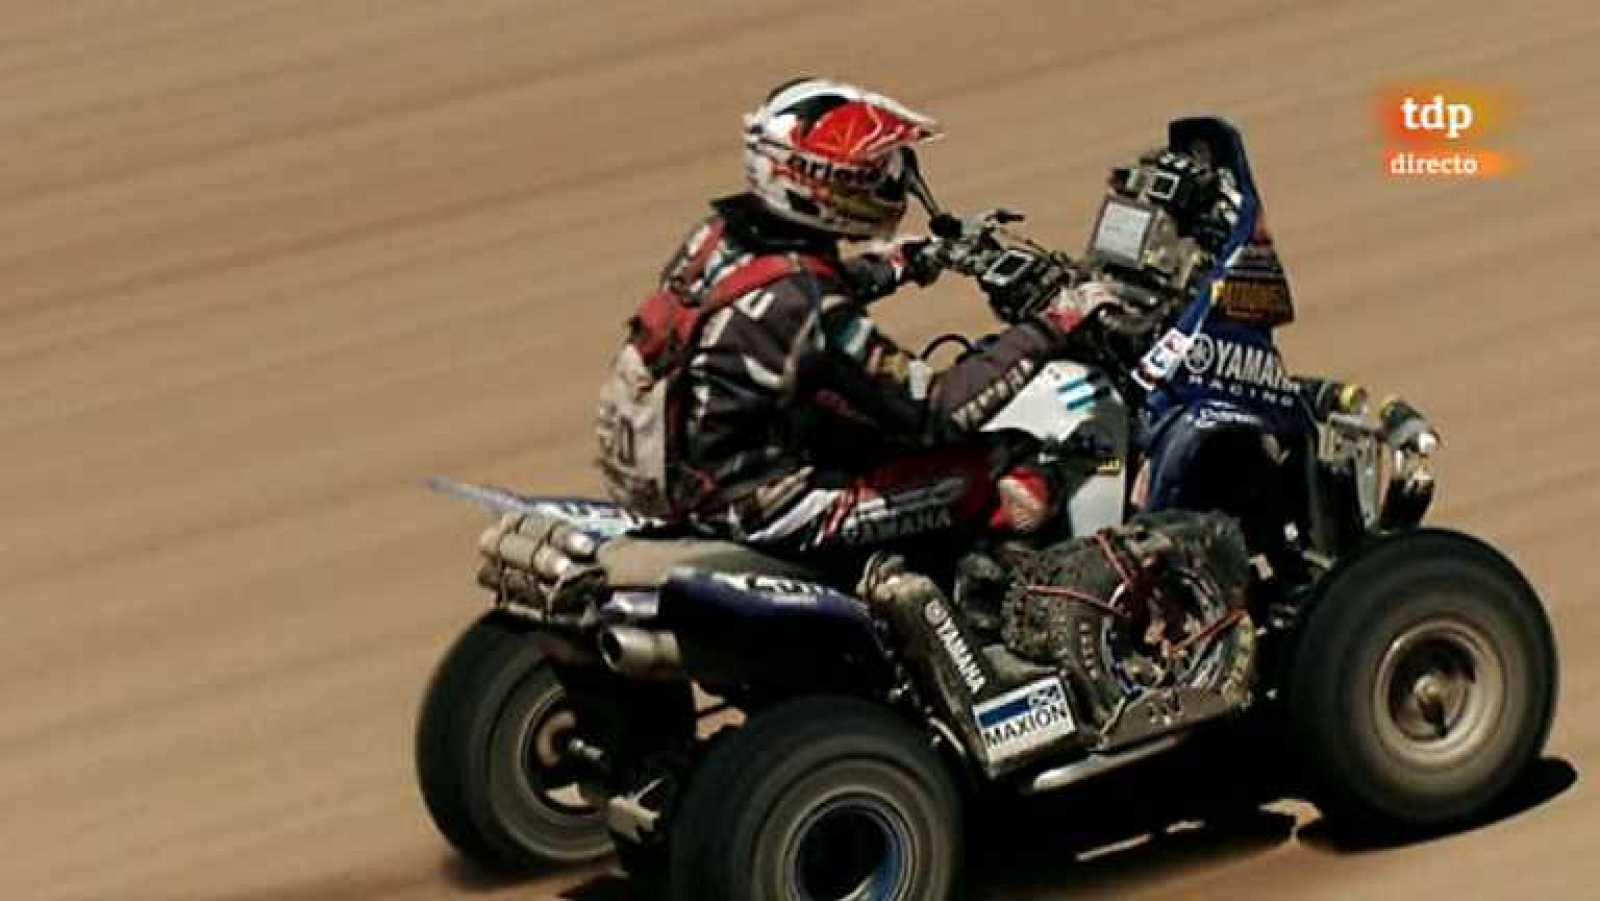 Rally Dakar 2013 - Etapa 12 (Fiambalá - Copiapó) - Ver ahora